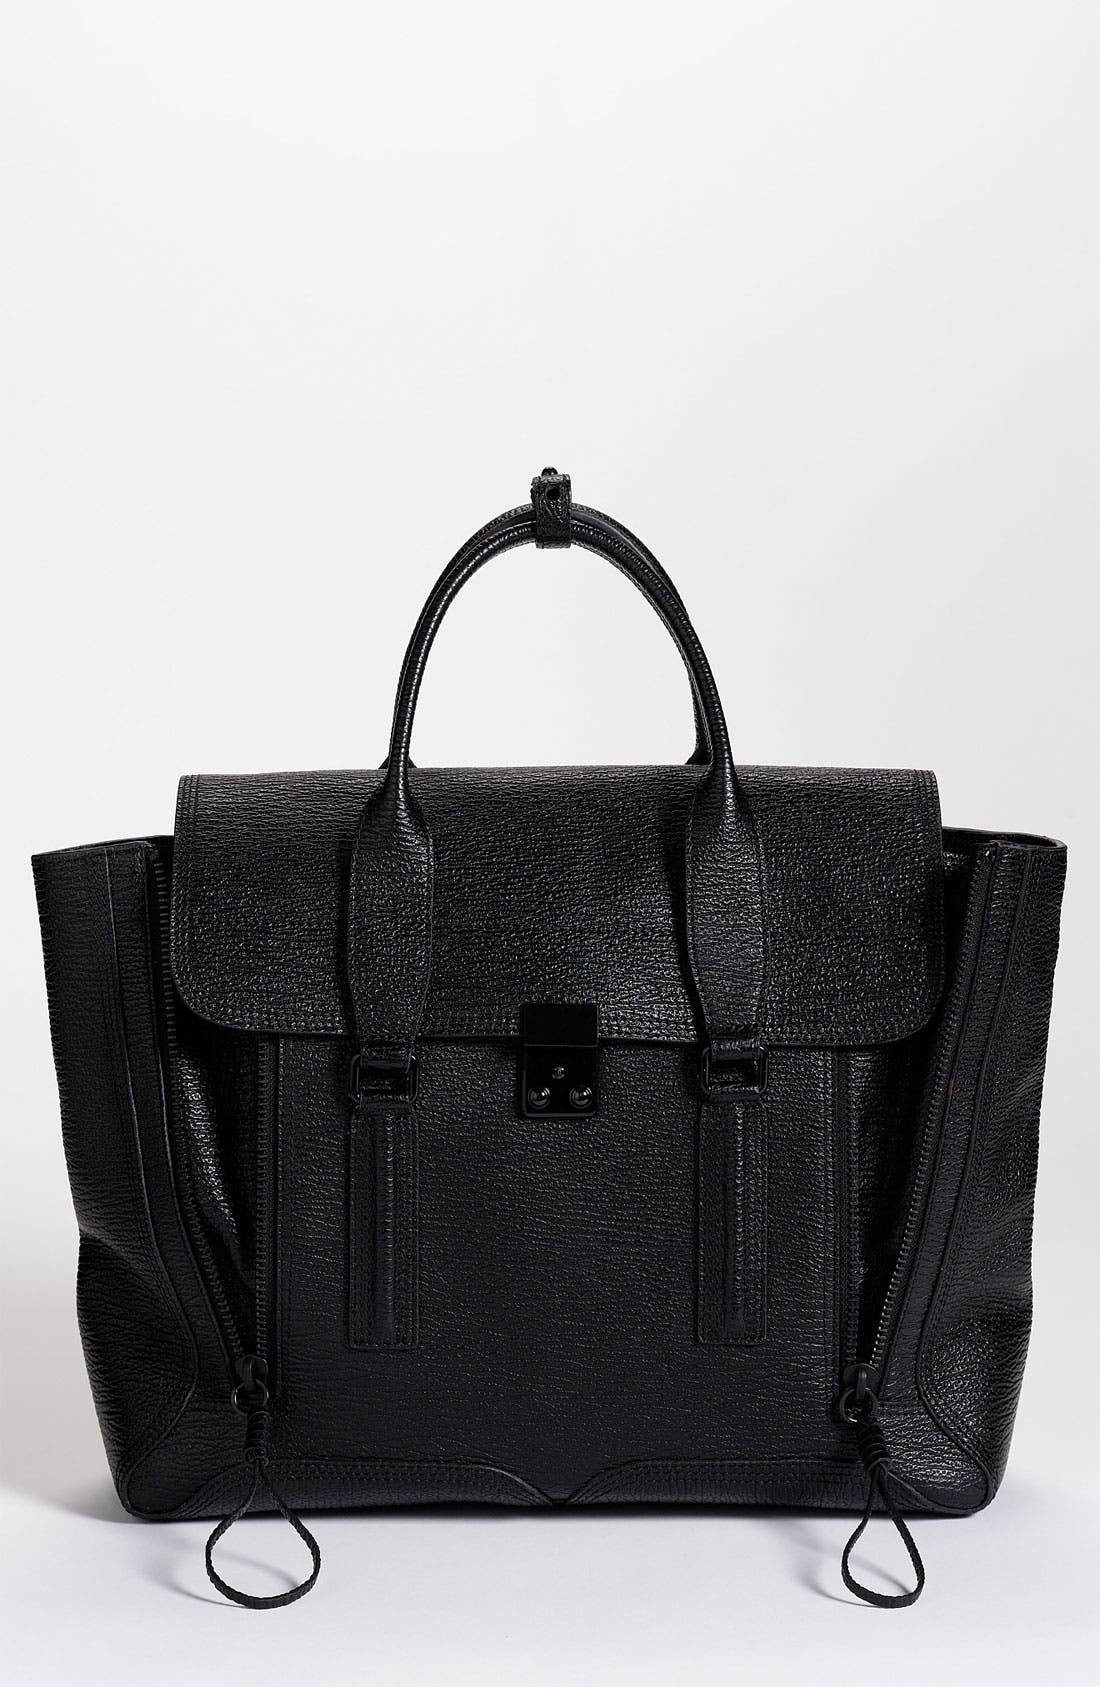 Main Image - 3.1 Phillip Lim 'Pashli' Leather Satchel